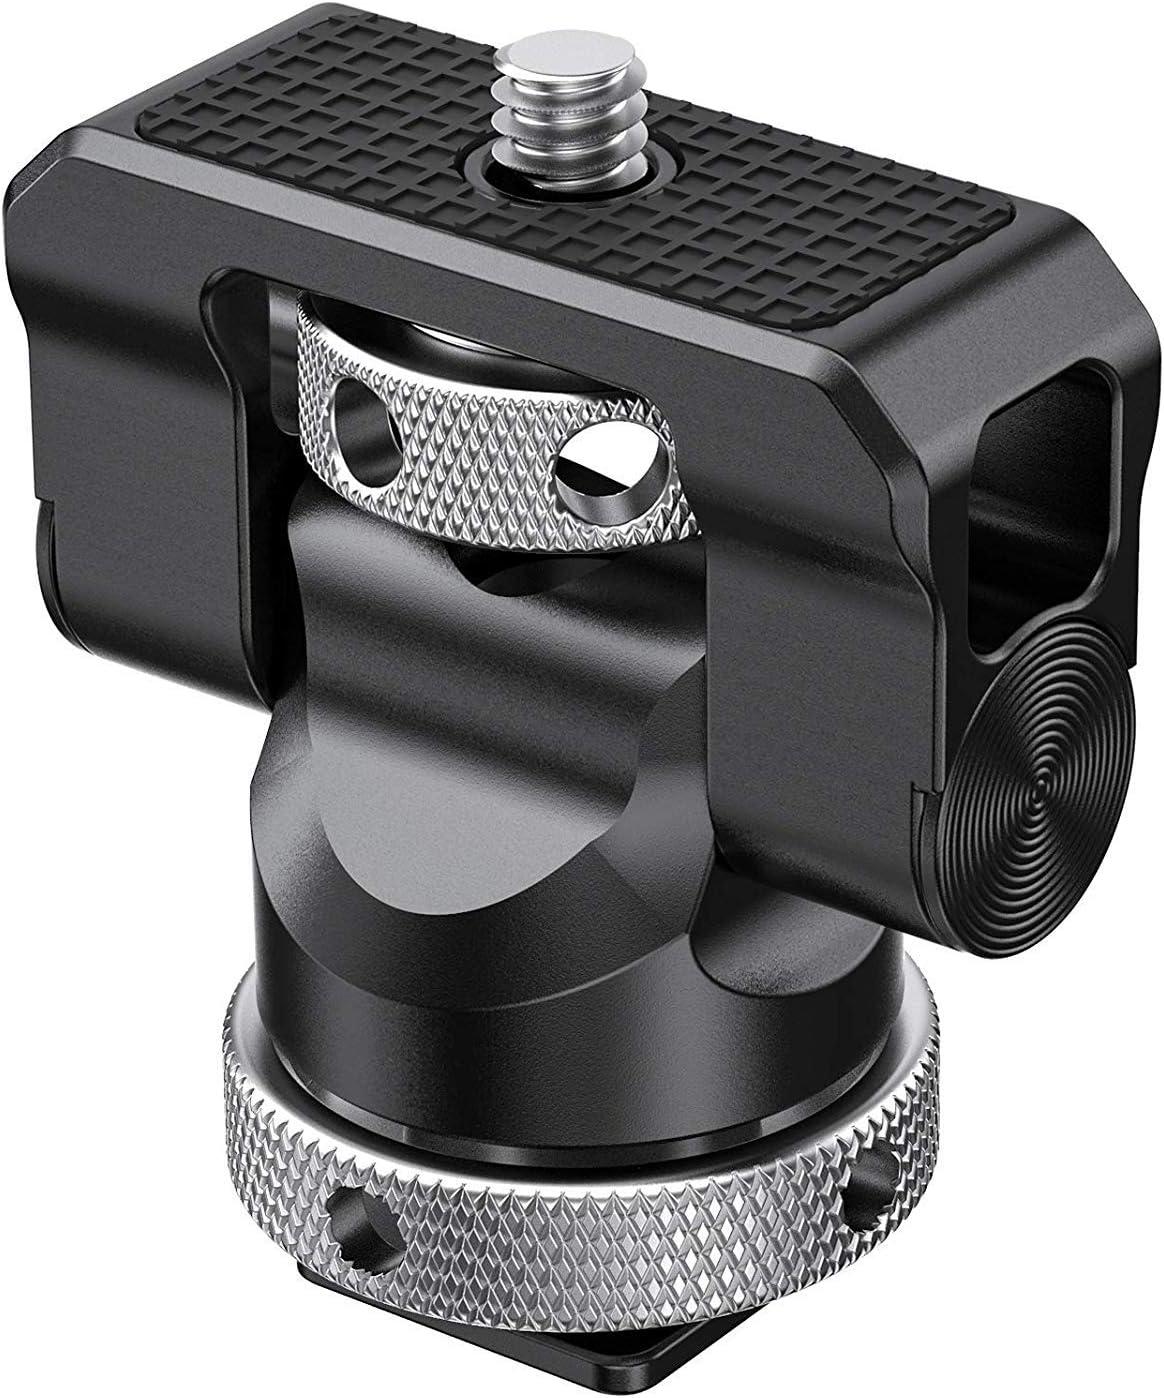 Smallrig Monitor Mount Monitorhalterung Mit Cold Shoe Kamera